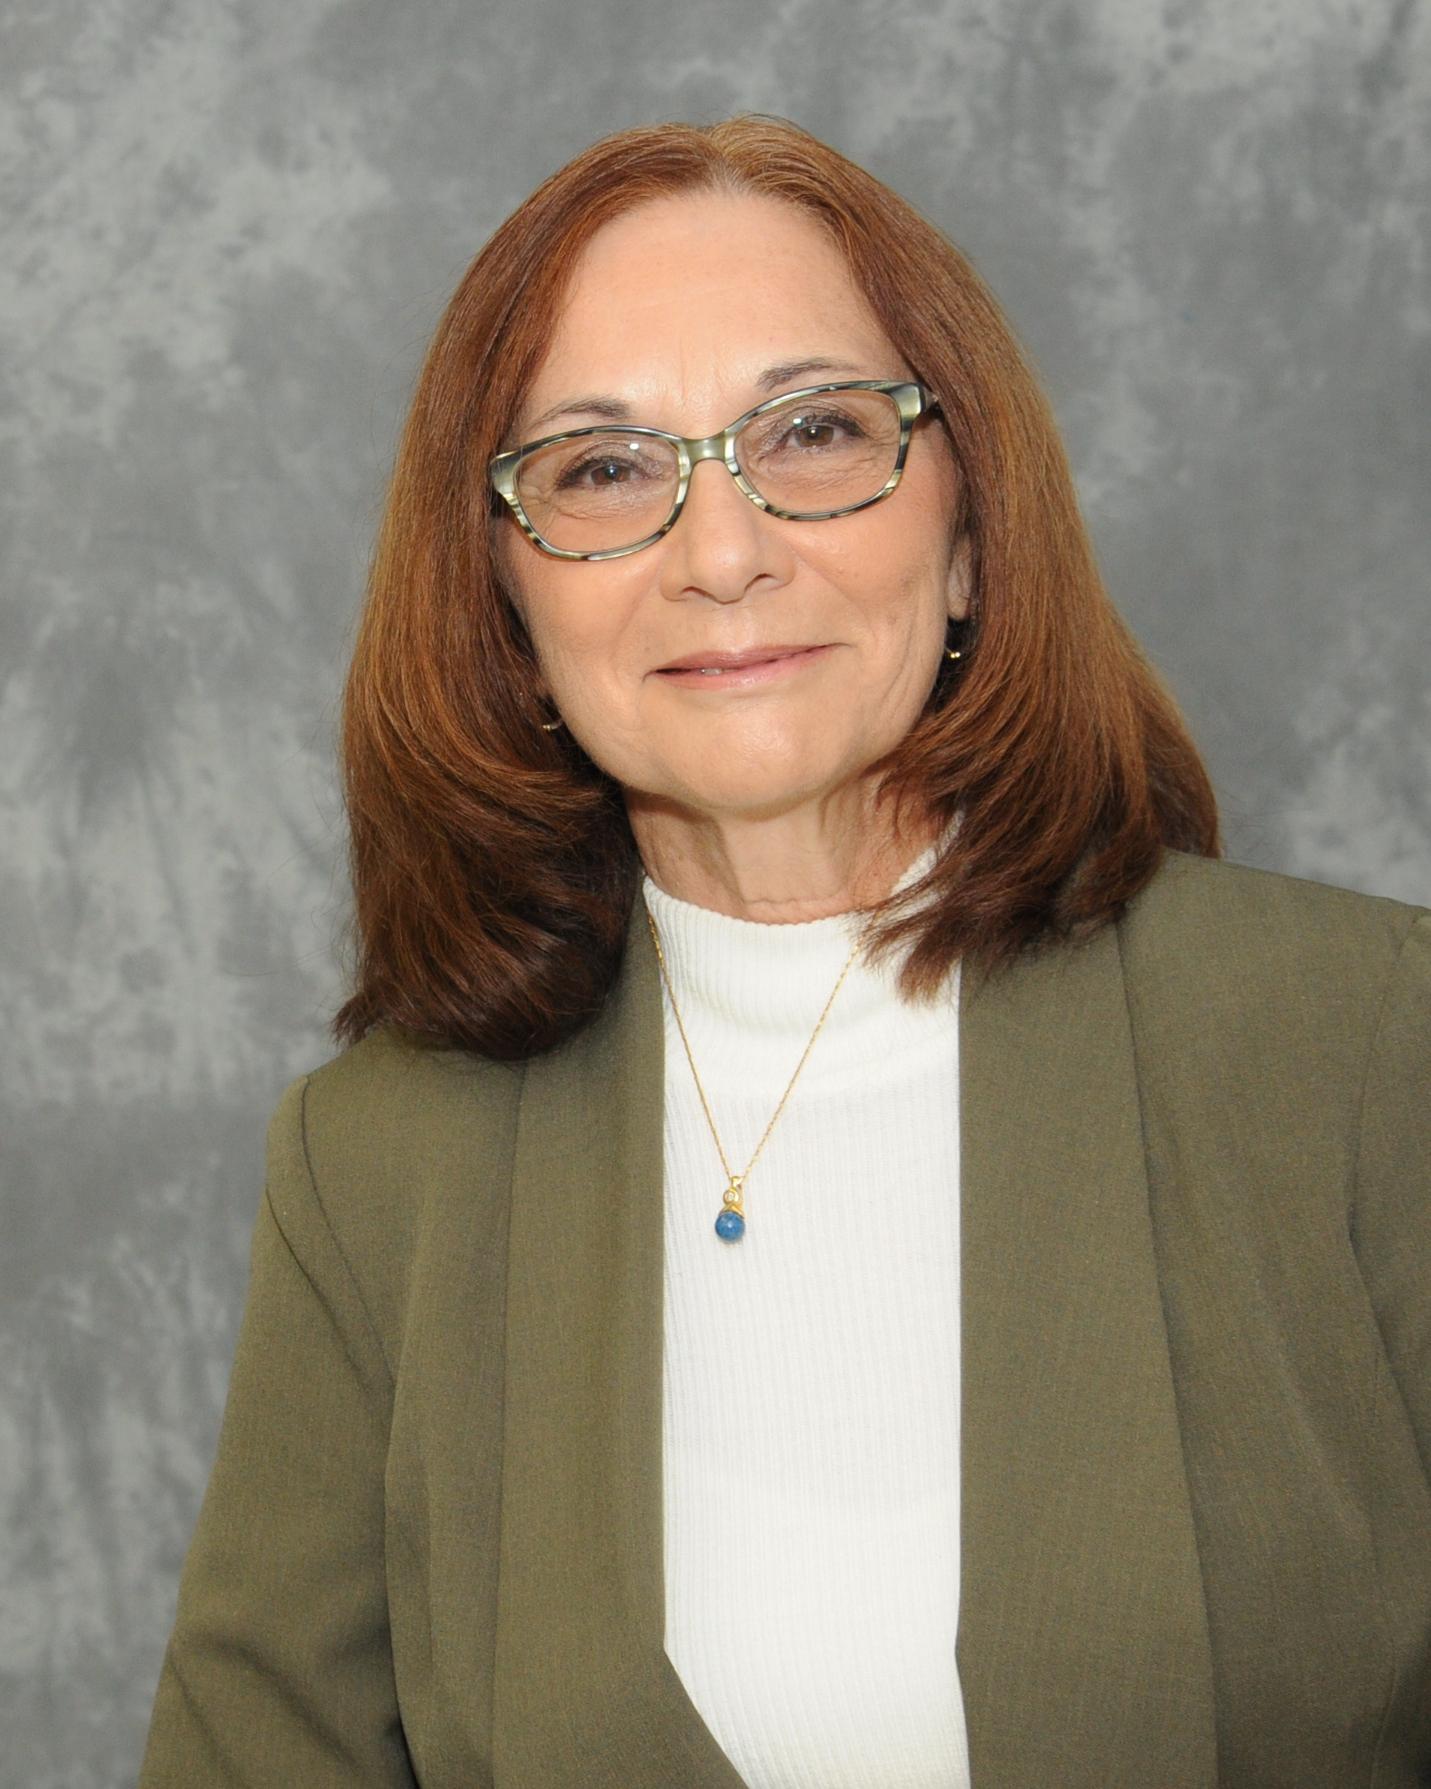 Barbara MastroDdi, EA - Senior Associate - Enrolled Agent Notary Public Member: NATP, NAEAEmail: barbara@solowayagency.com